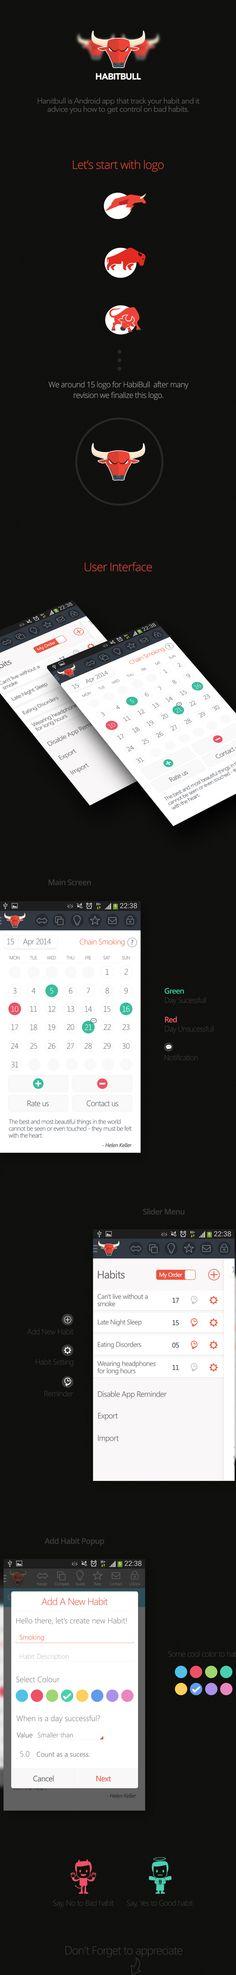 HabitBull app by Amir Vhora: beautiful #FlatDesign. Downloadable from the Google Play Store: https://play.google.com/store/apps/details?id=com.oristats.habitbull